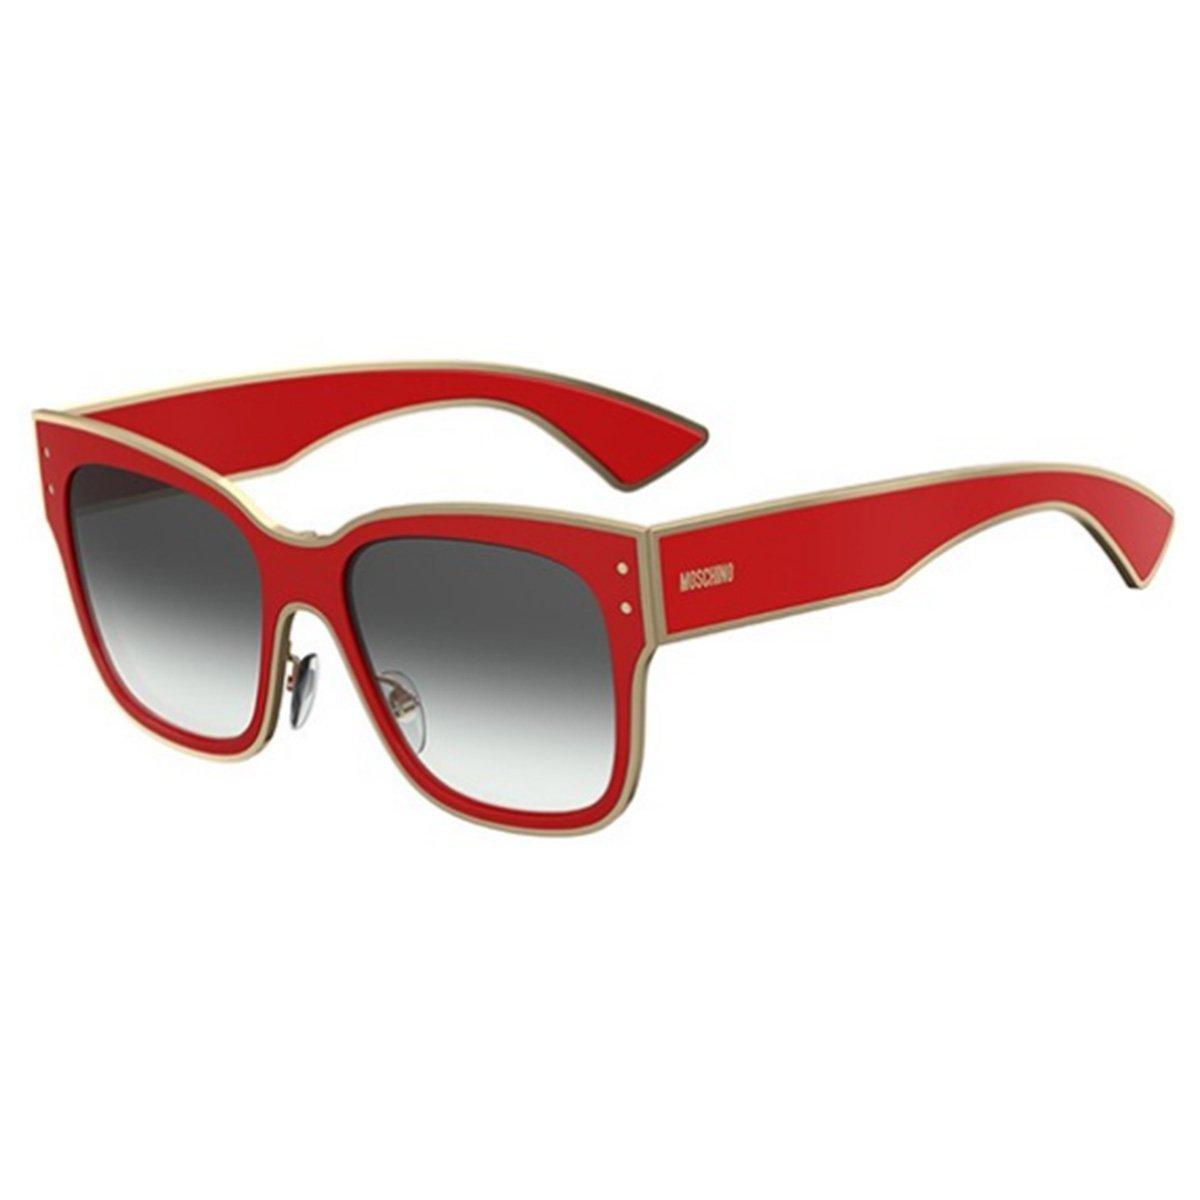 6565d2bed12c2 Compre Óculos de Sol Moschino em 10X